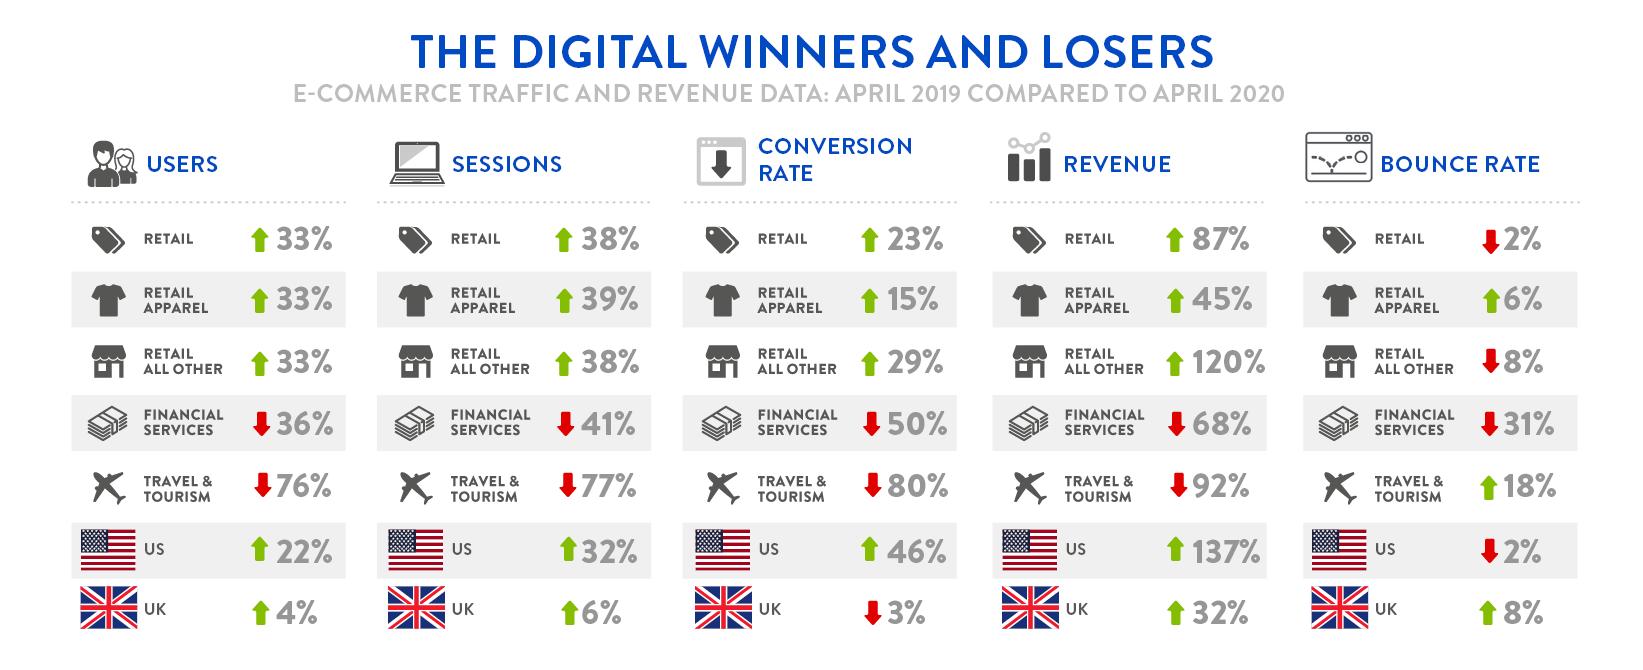 Digivante Infographic - April 2019 Compared to April 2020